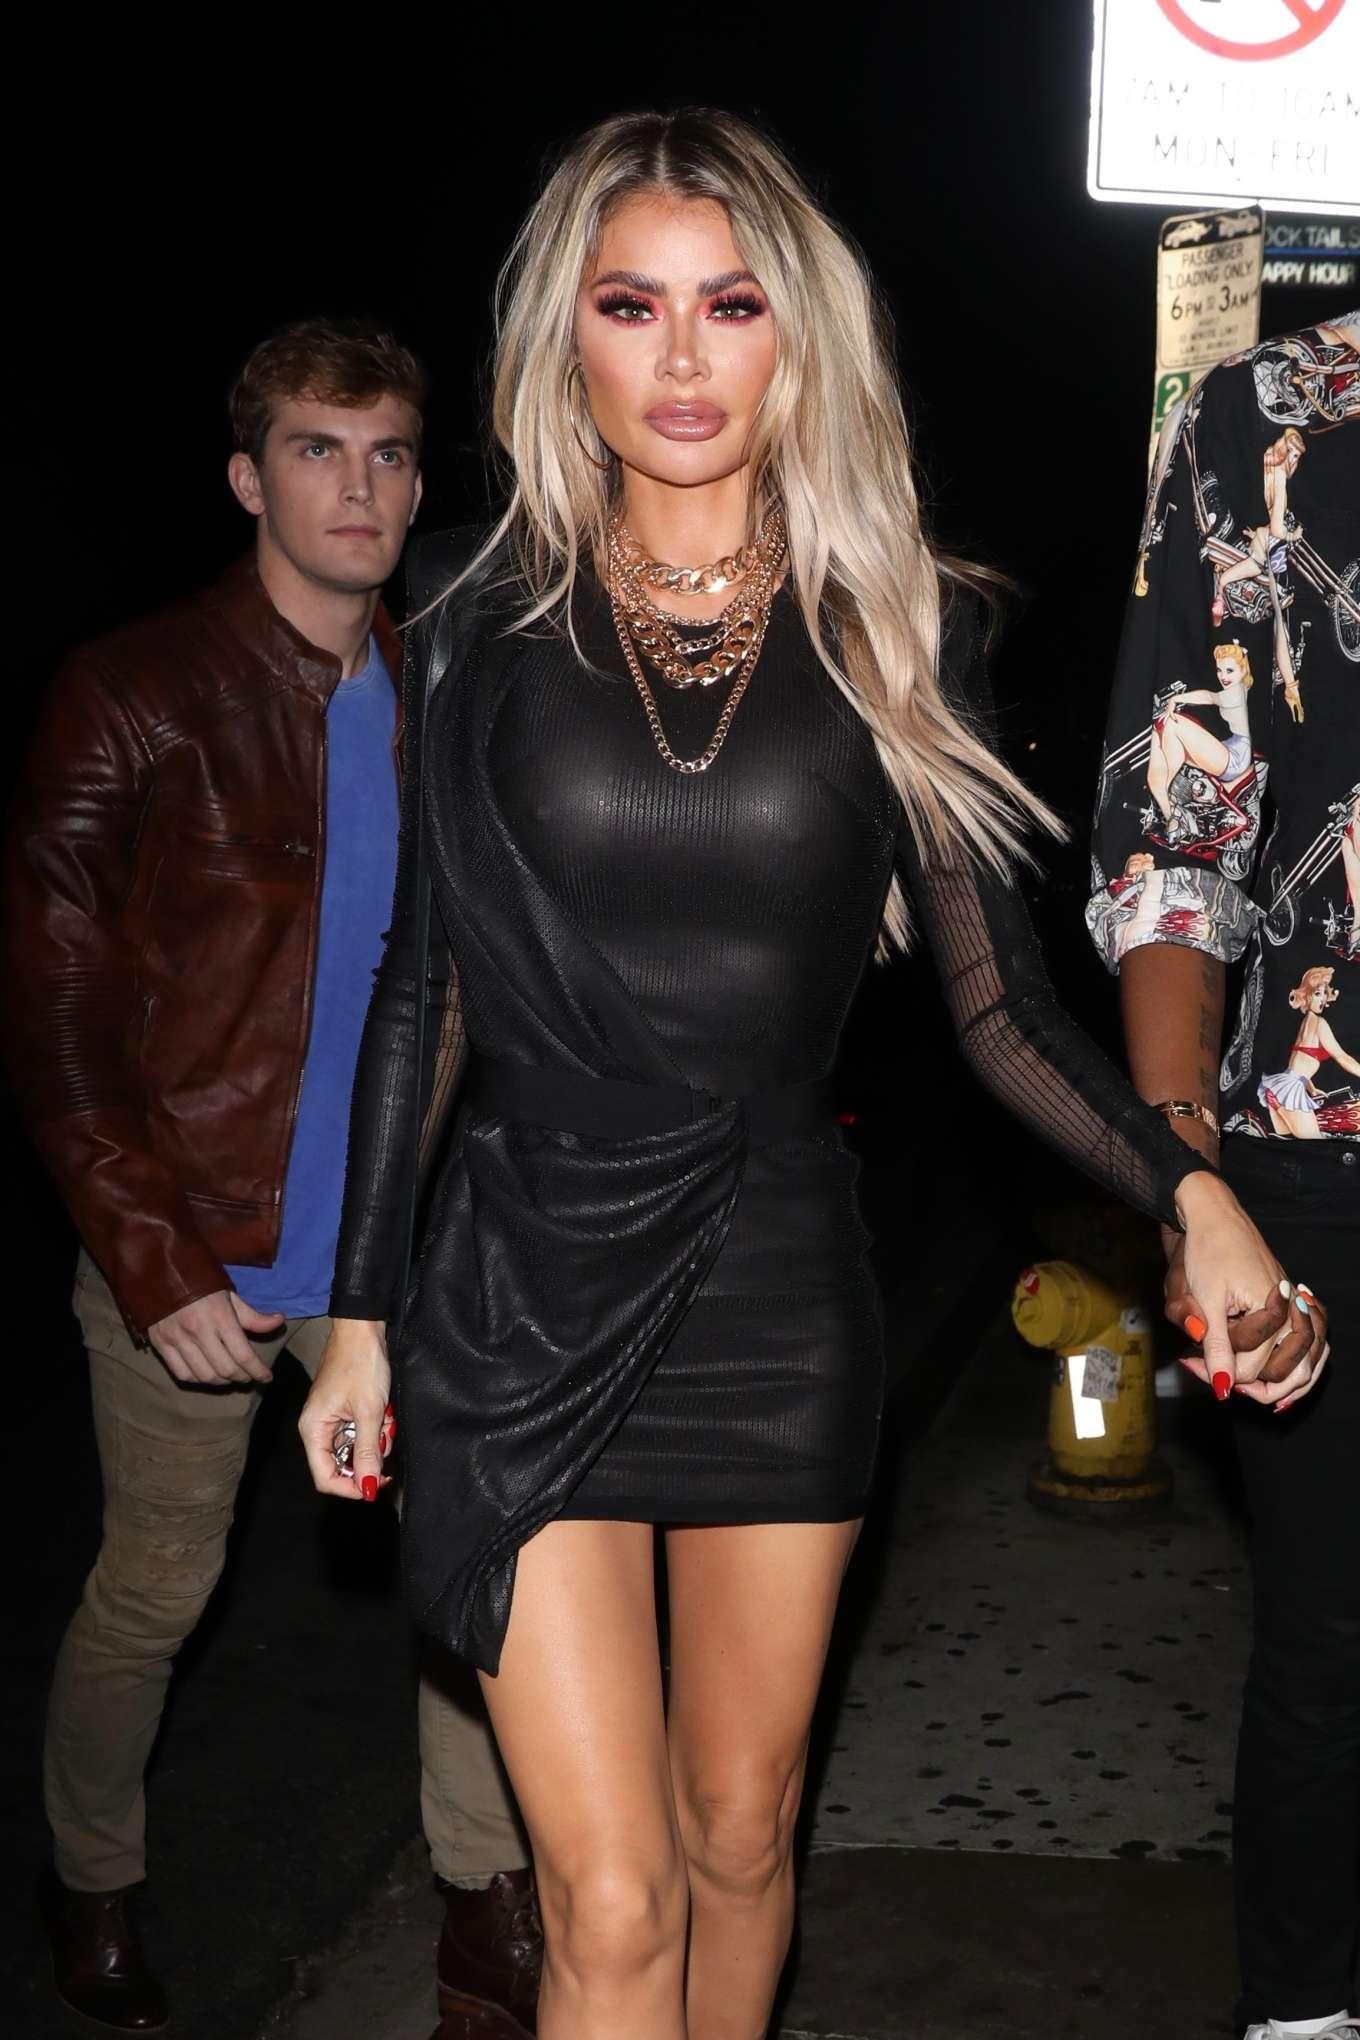 Chloe Sims - Night partying at Poppy Nightclub in West Hollywood